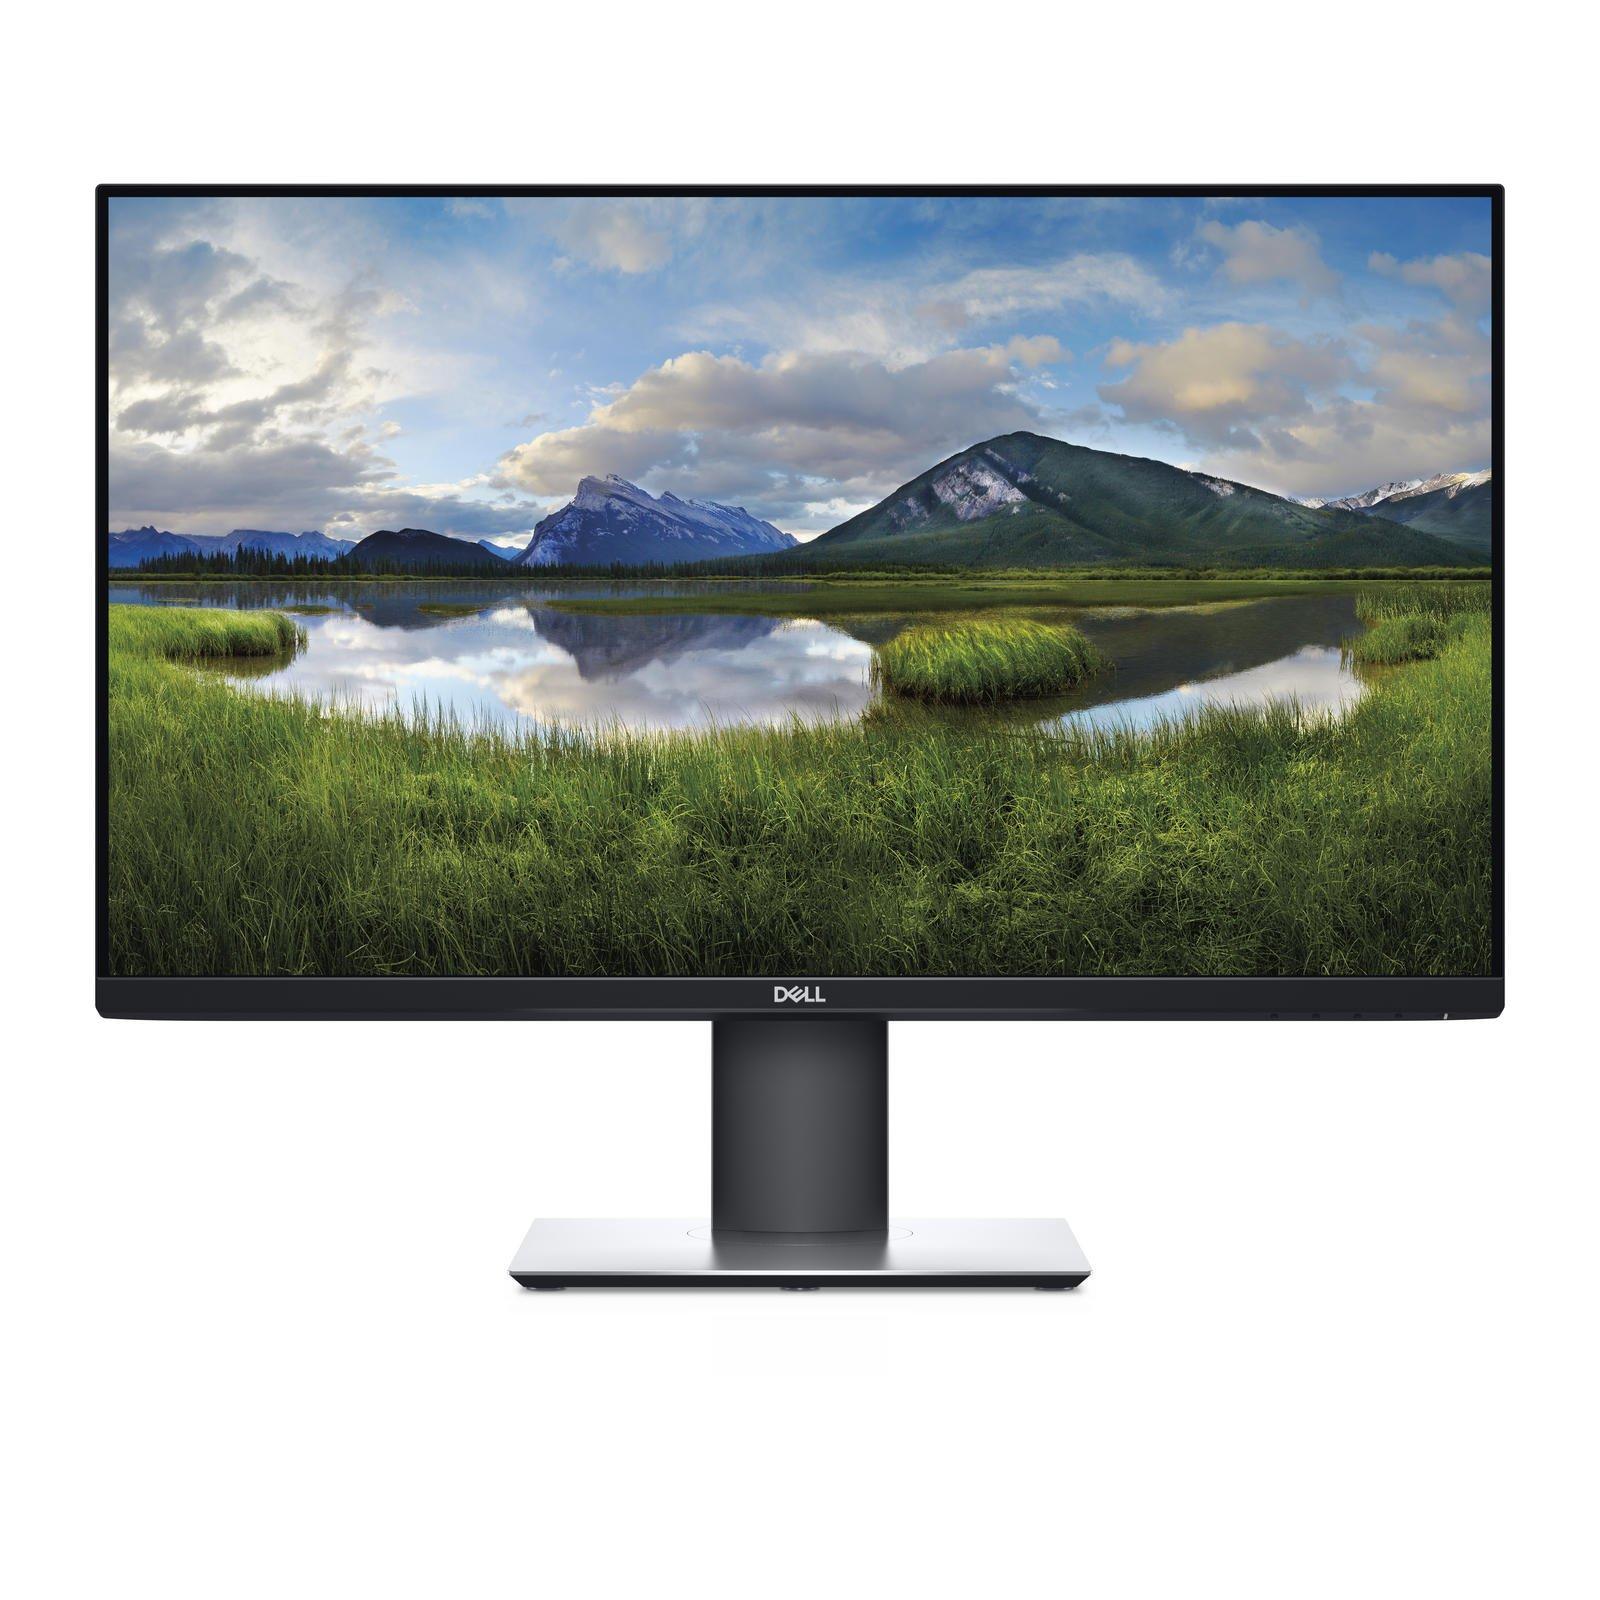 "Dell P2720D Monitor ( 27""/ 68,6cm, 2560x1440, IPS, 8ms, 350 cd/m², HDMI, DisplayPort, USB, VESA-Halterung, Höhenverstellung )"